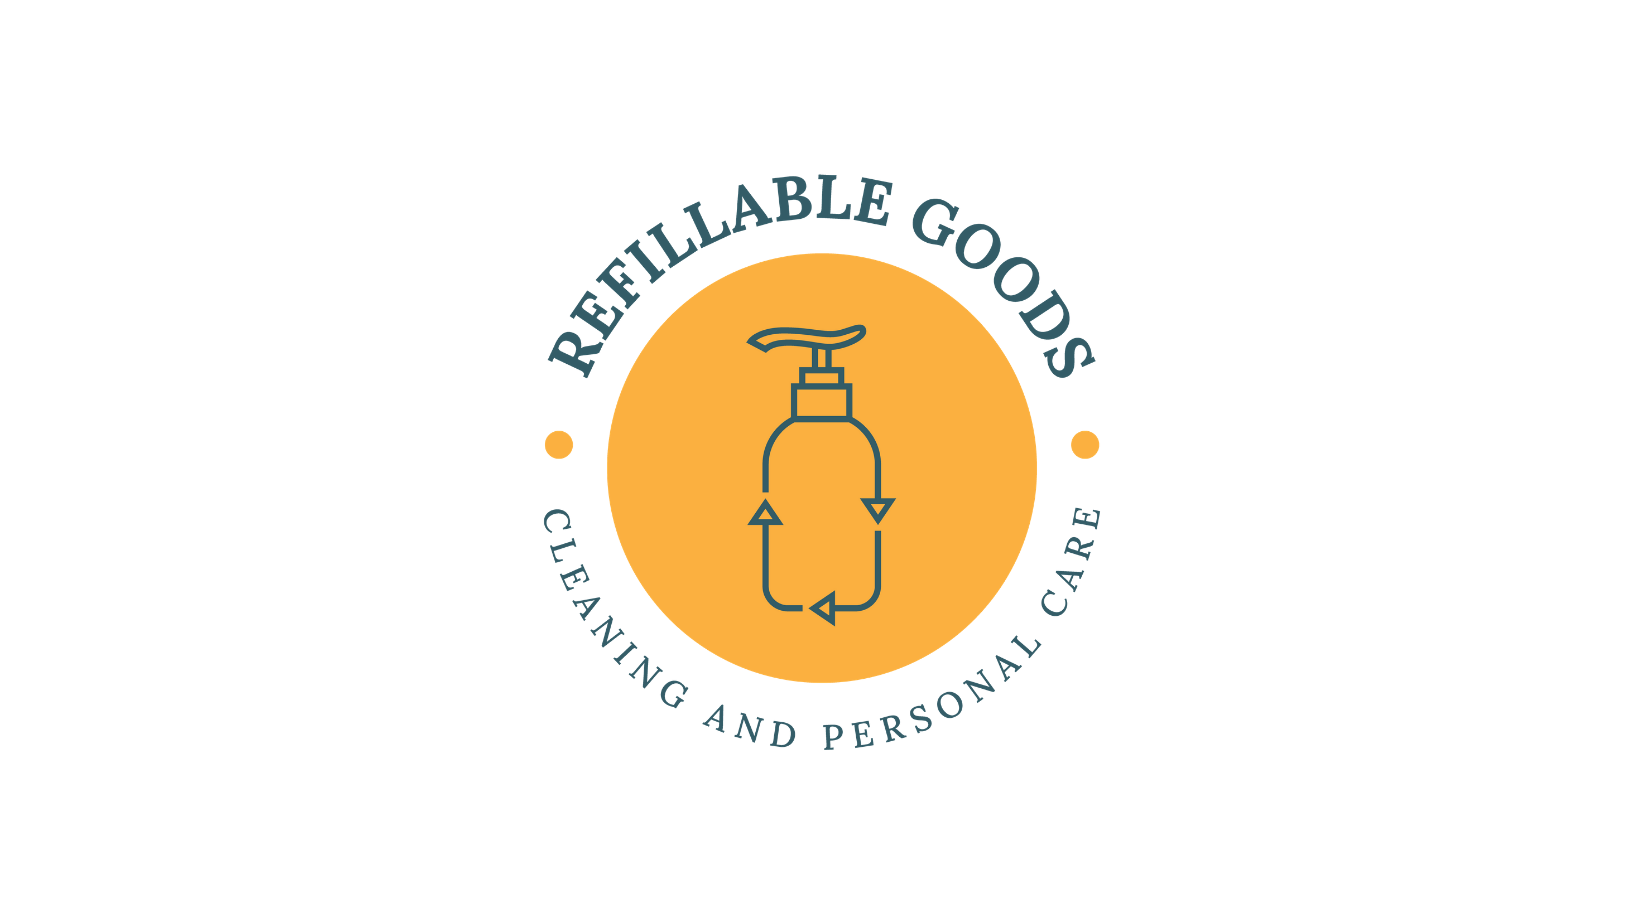 refillablegoods-logo